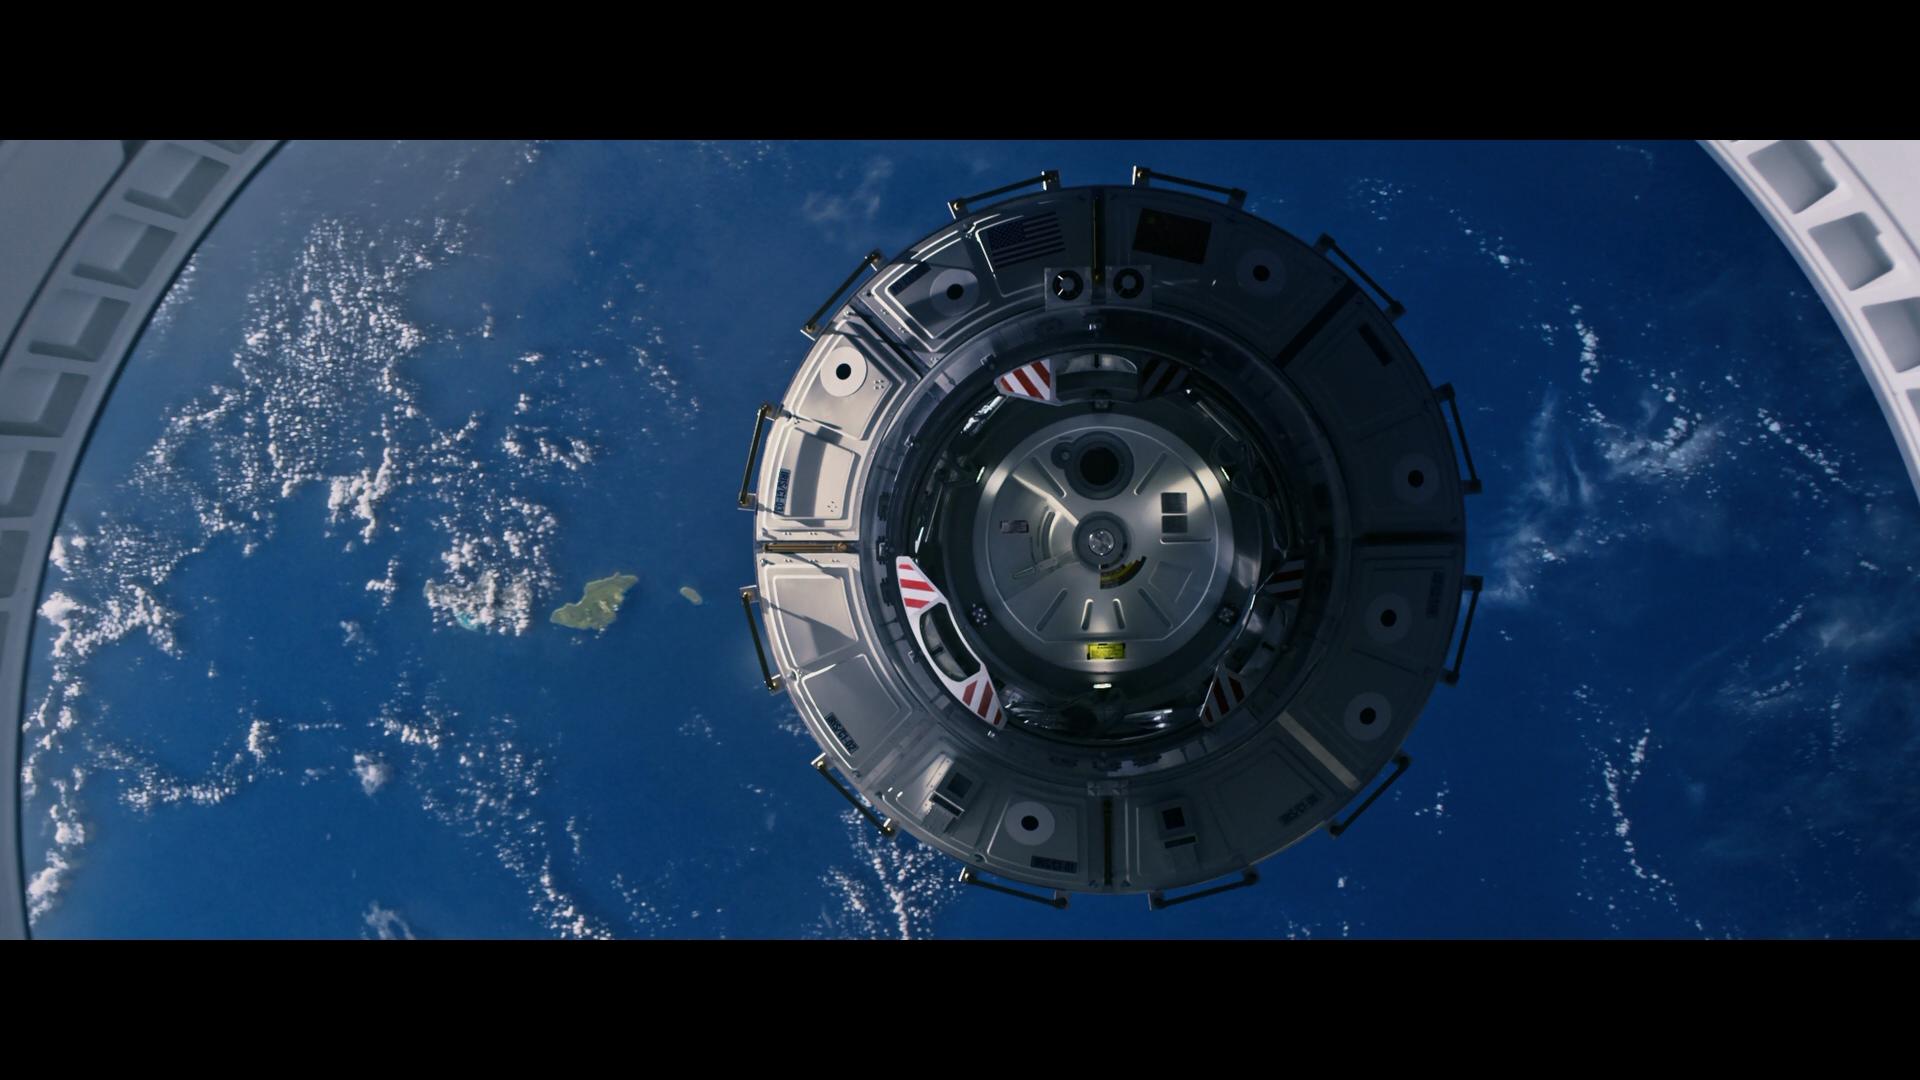 Ёлки 3 (2013) 4